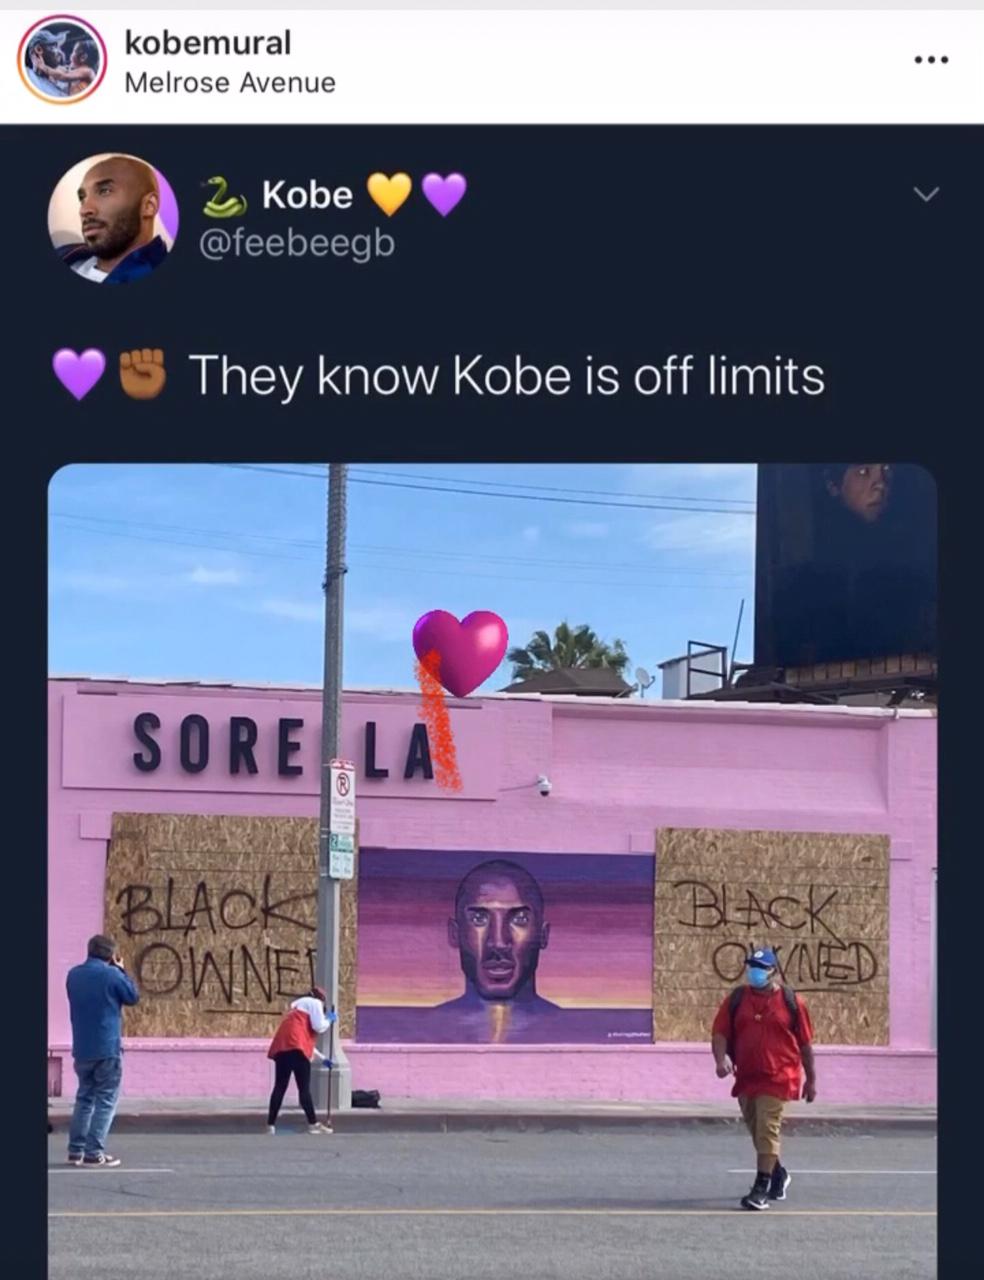 Mural Kobe Bryant